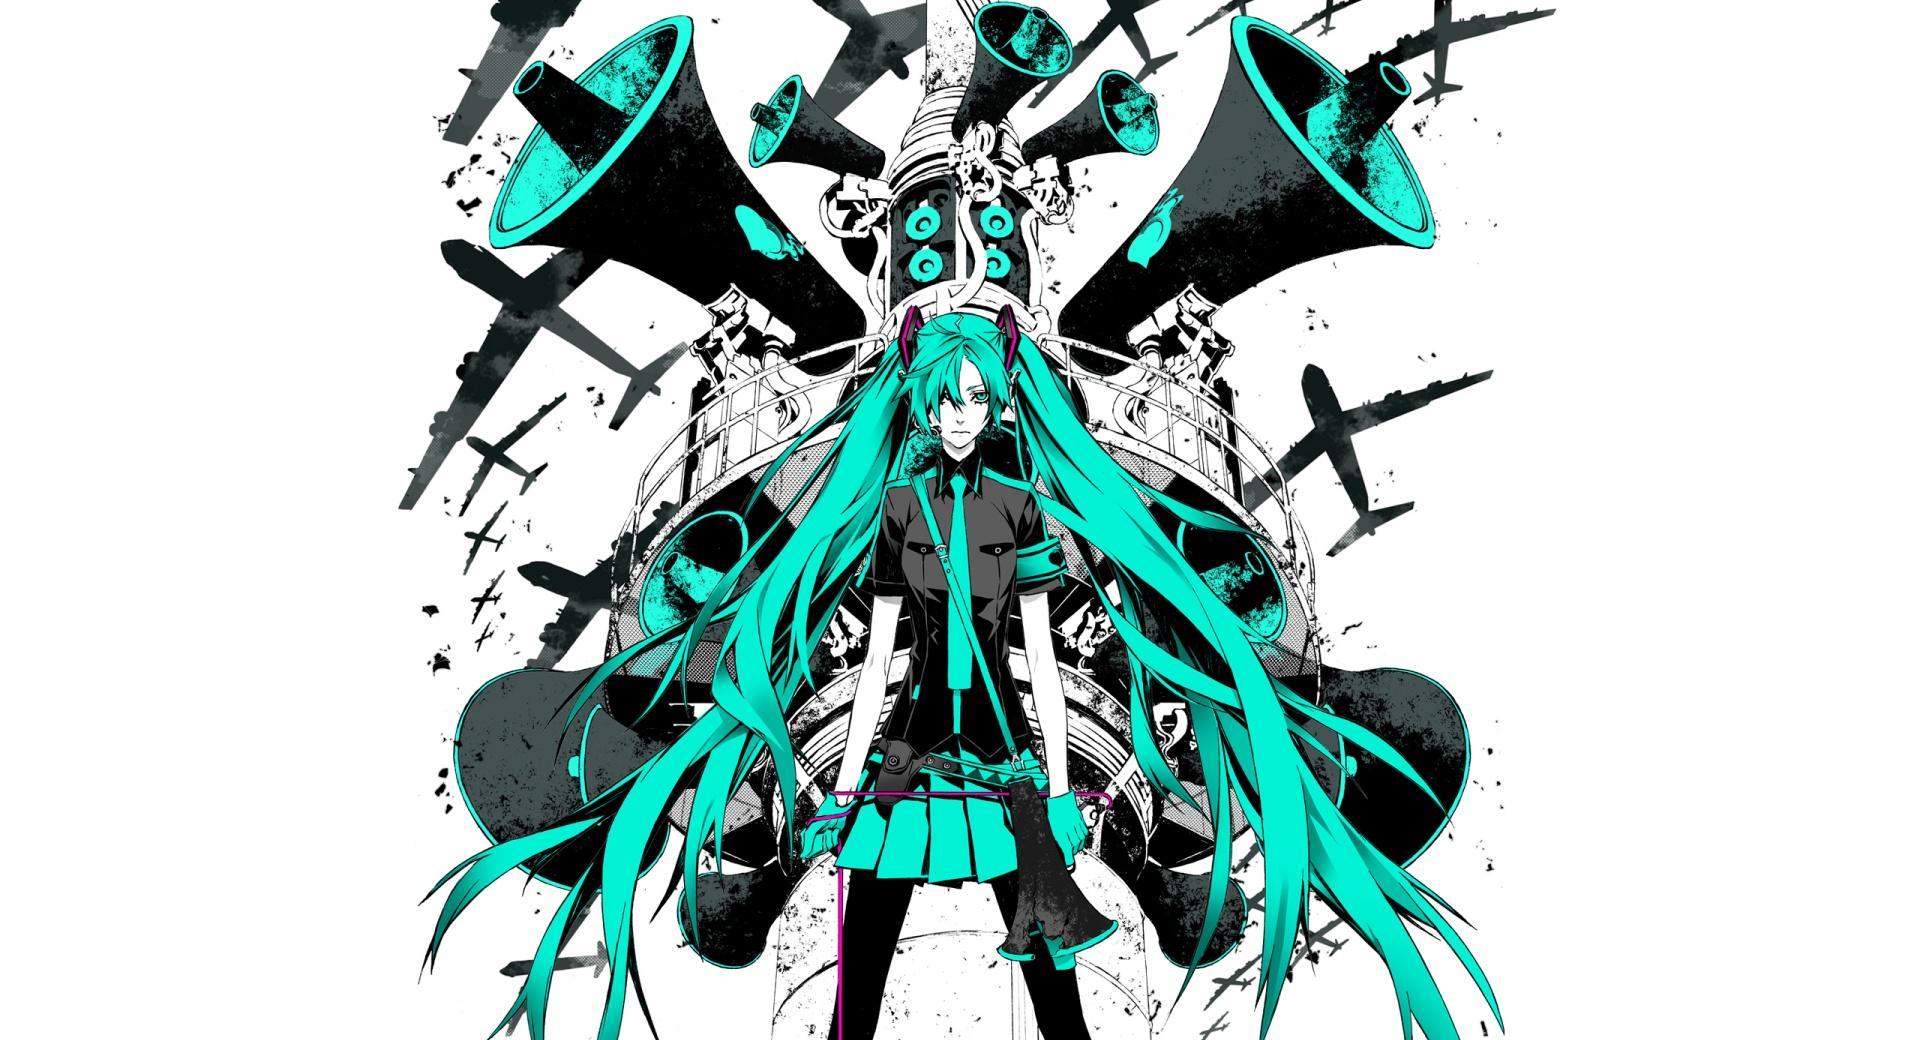 Vocaloid Hatsune Miku wallpapers HD quality